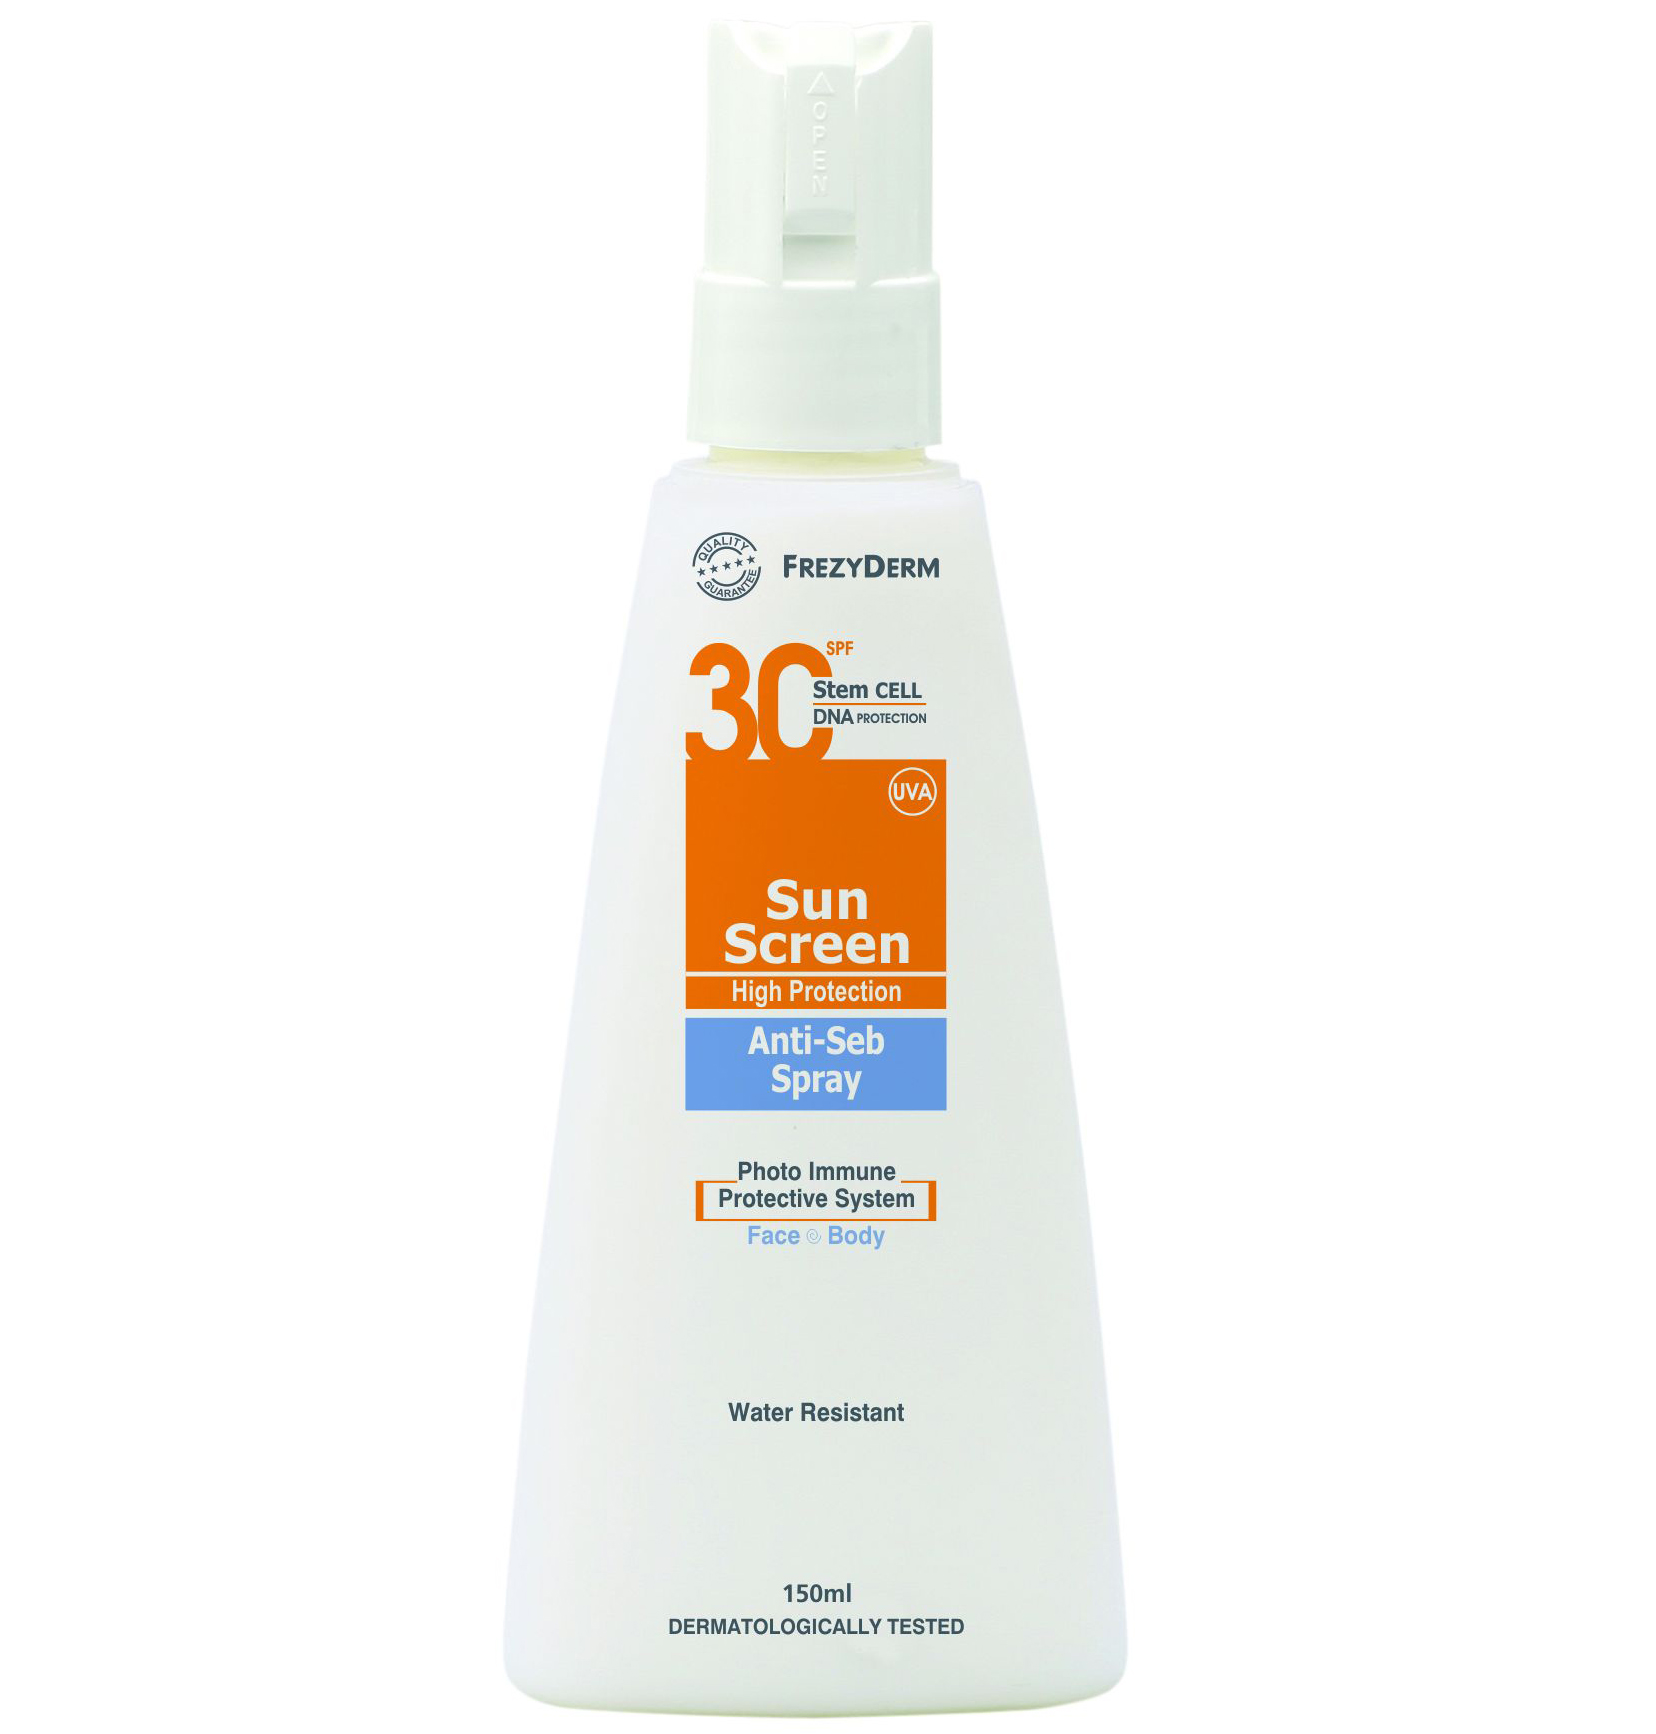 Frezyderm Sun Screen Anti-Seb Spray SPF 30/UVA Αντιηλιακό Γαλάκτωμα spray Κατά Της Ακμής 150ml